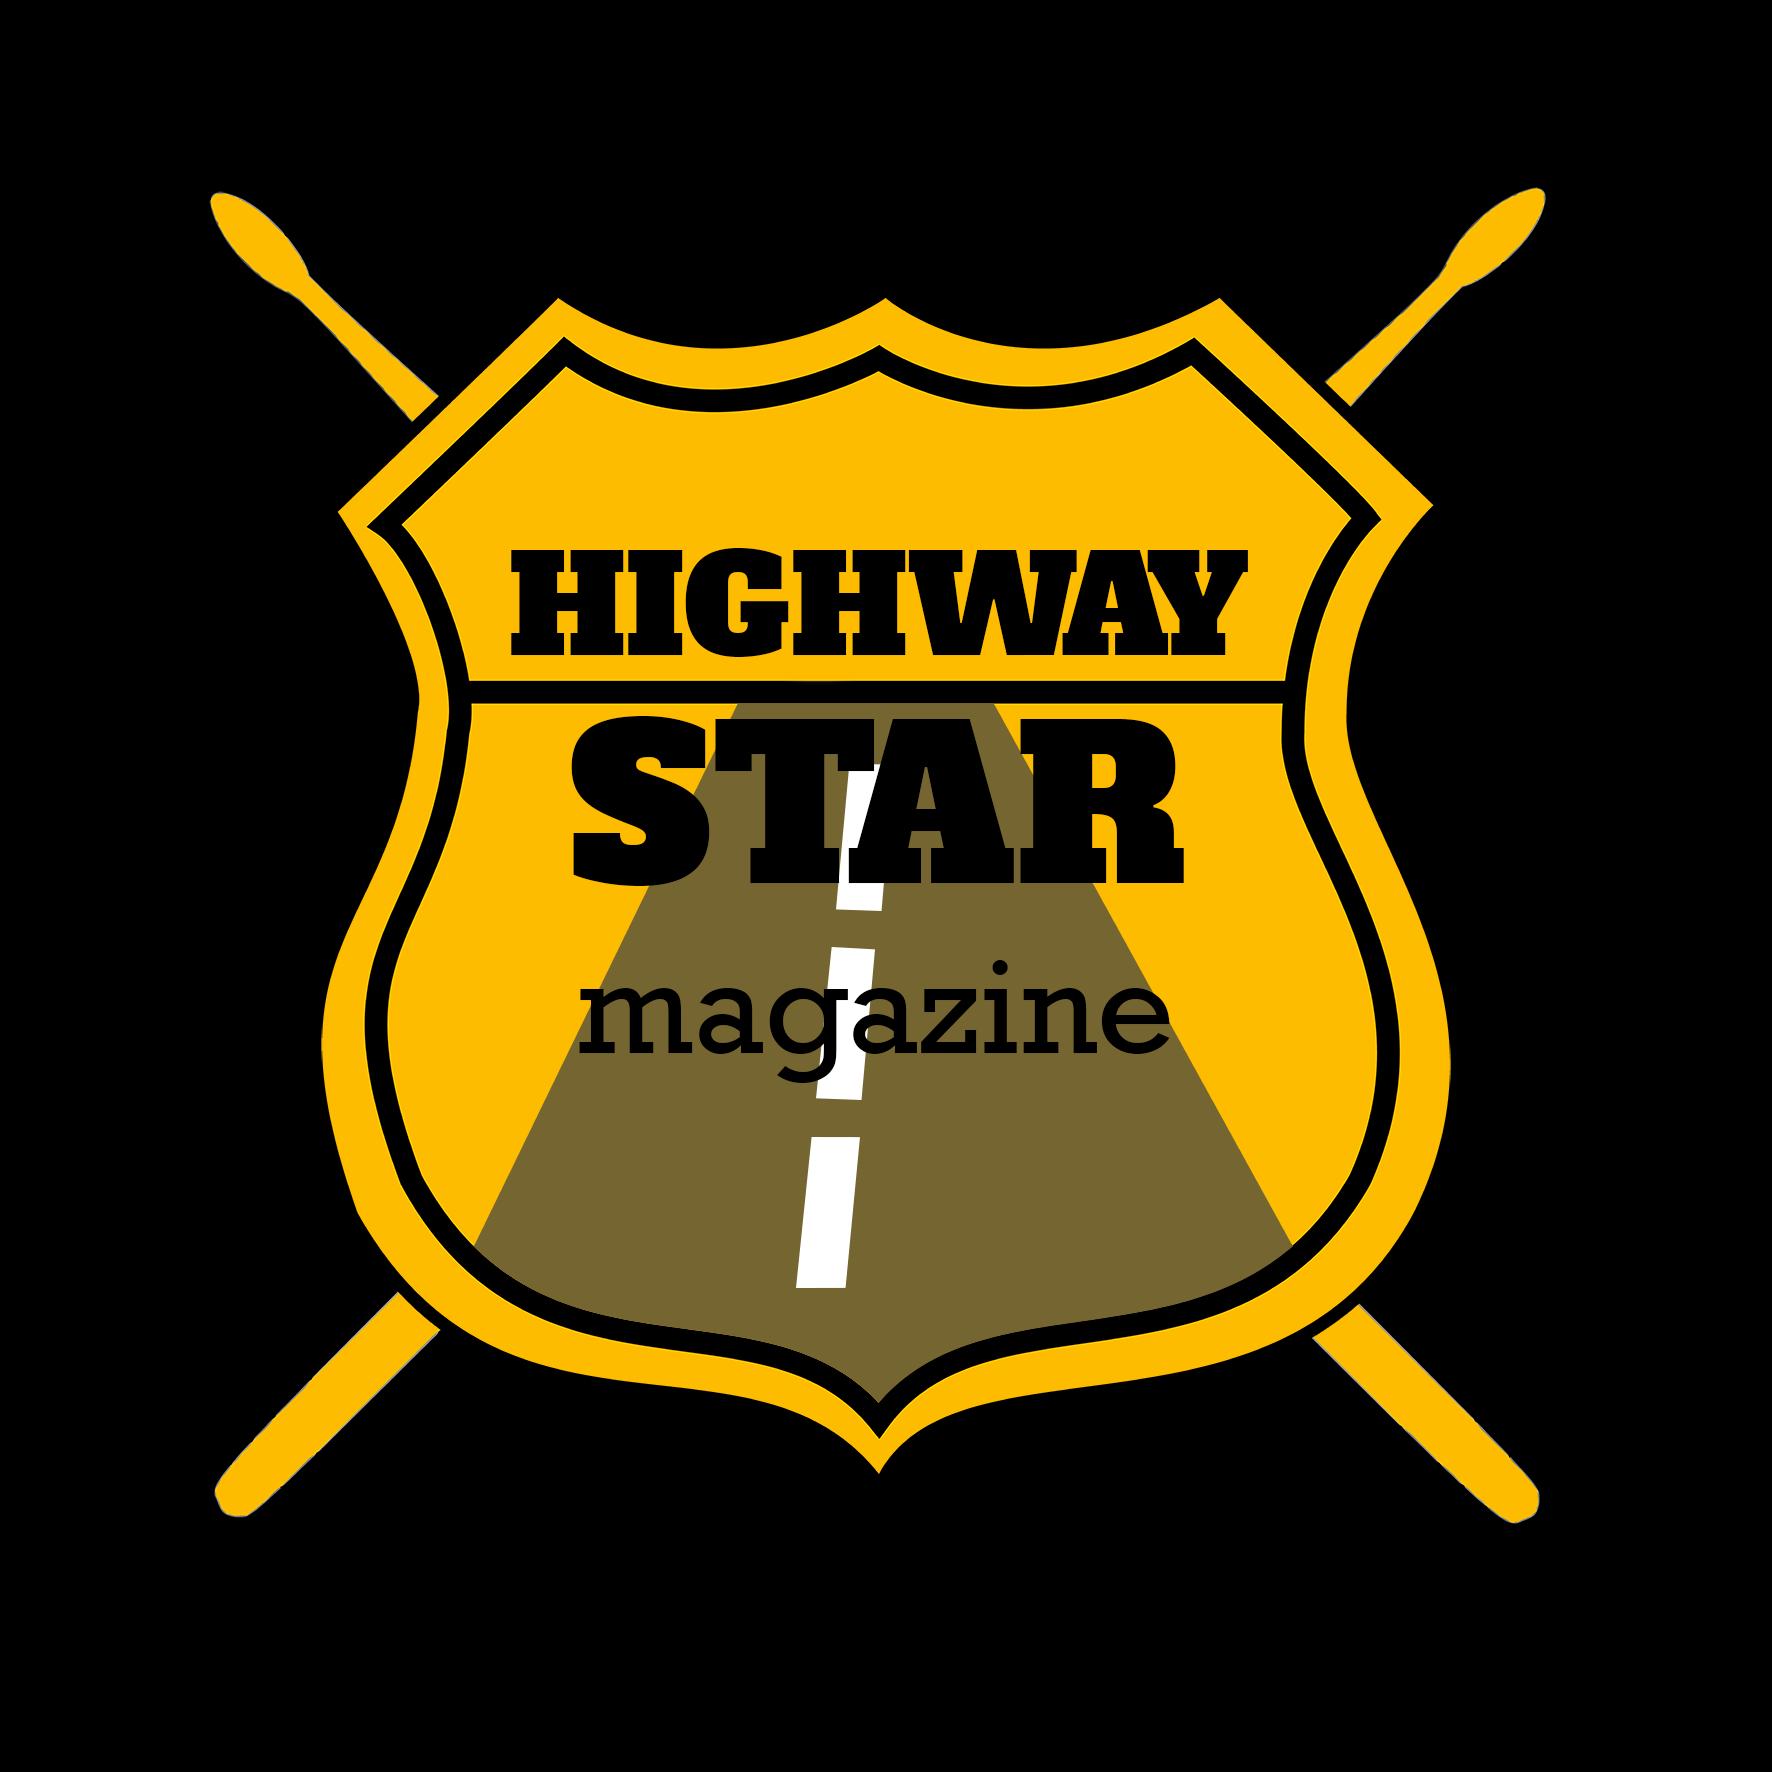 Highwaystar radio